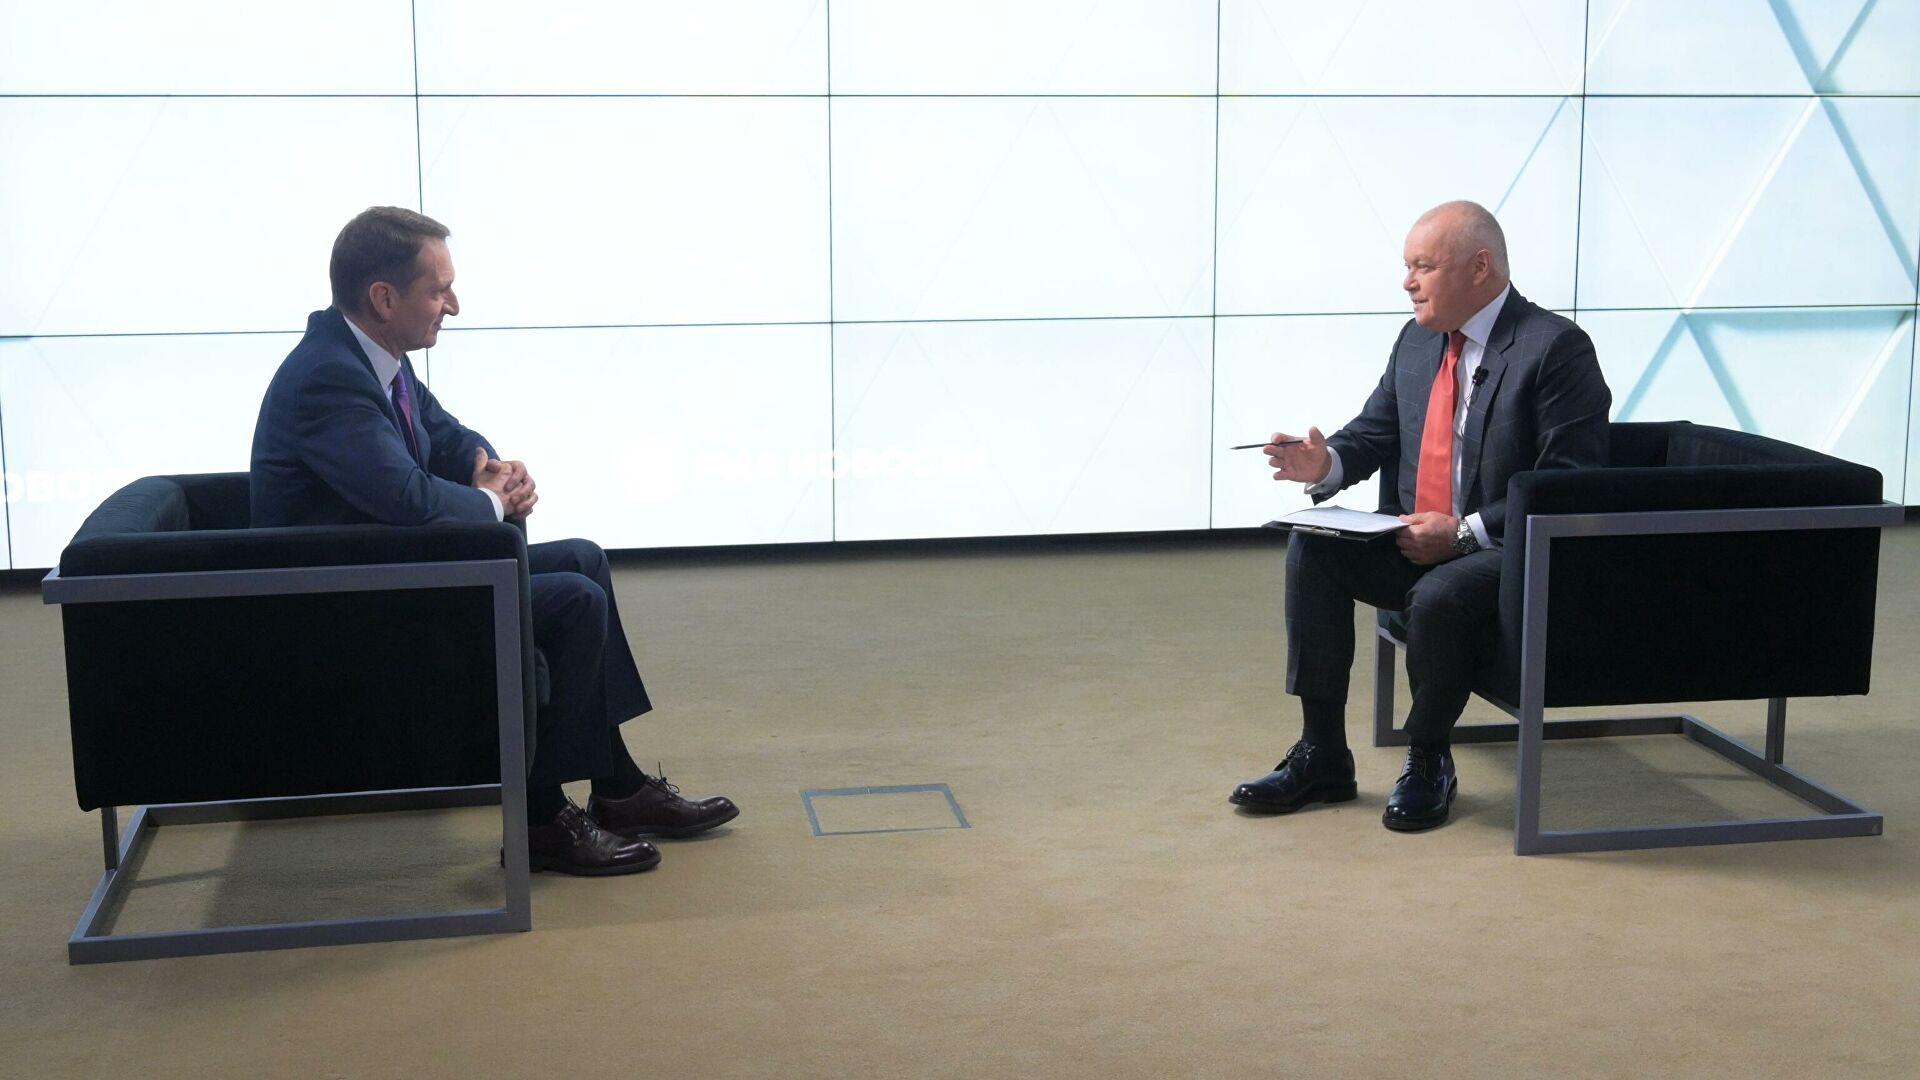 SVR Director Sergei Naryshkin is interviewed by Dmitry Kiselyov, TV anchor and general director of Rossiya Segodnya (Source: RIA Novosti)